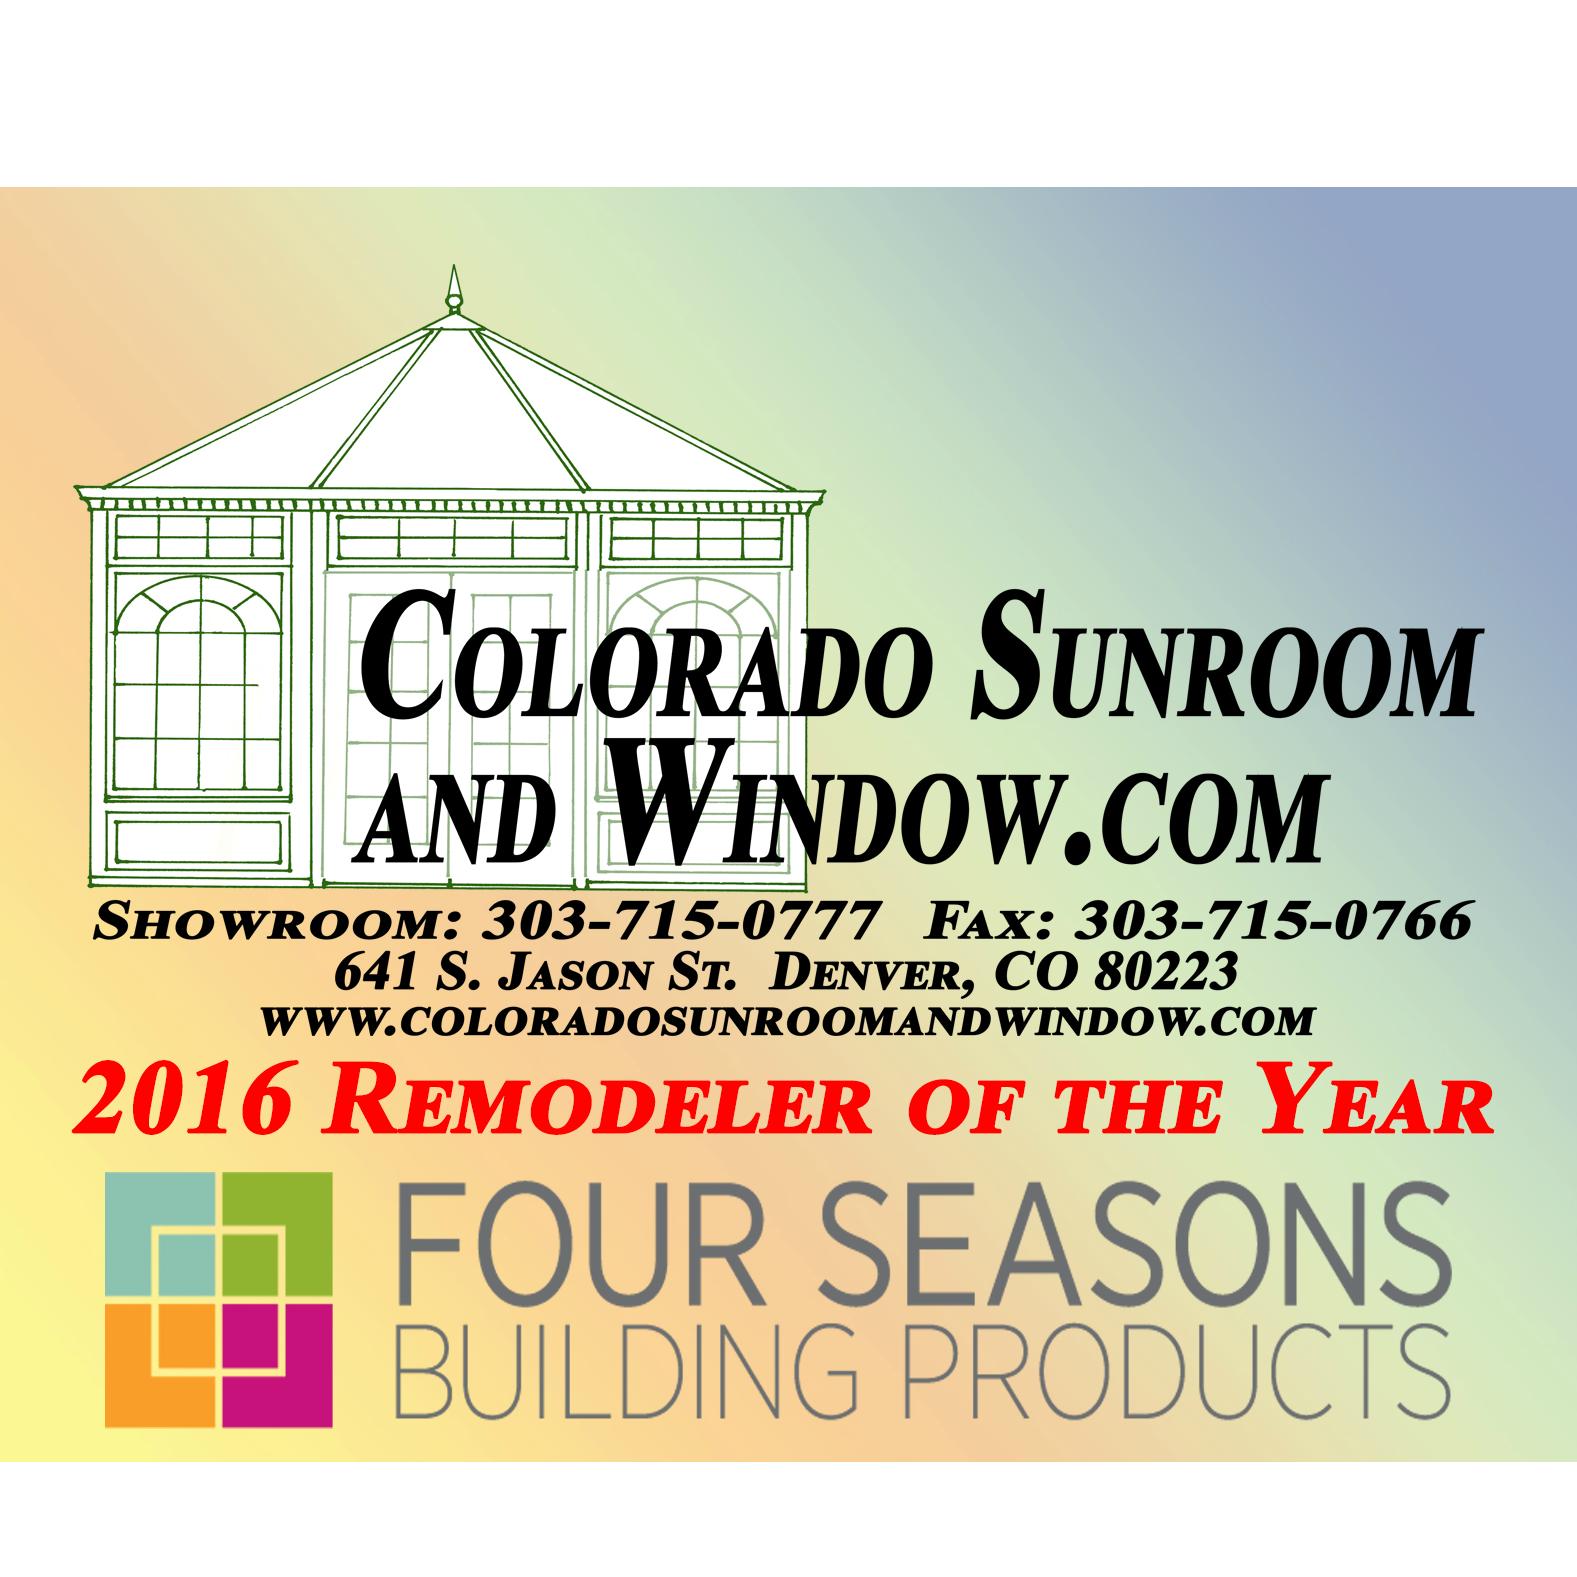 Colorado Sunroom and Window Distributors